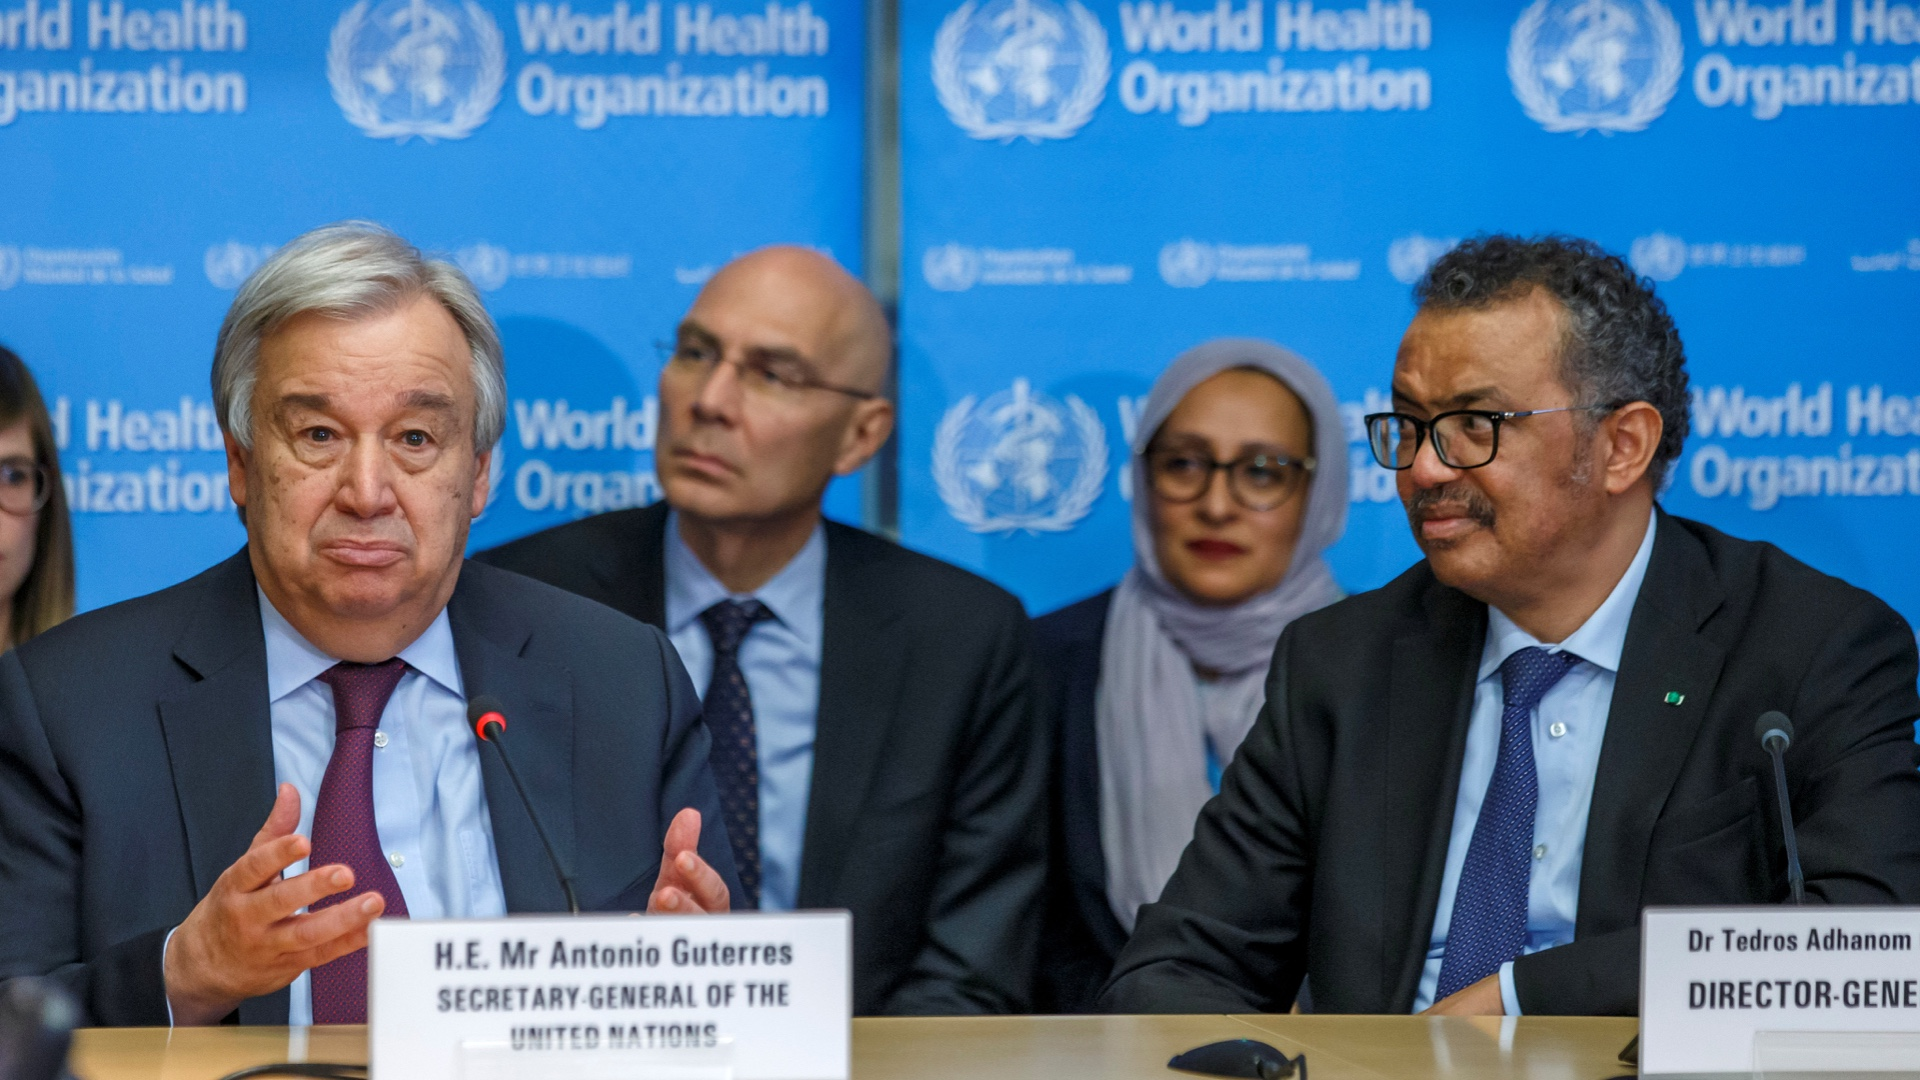 Opinion - WHO UN - Karsten Noko